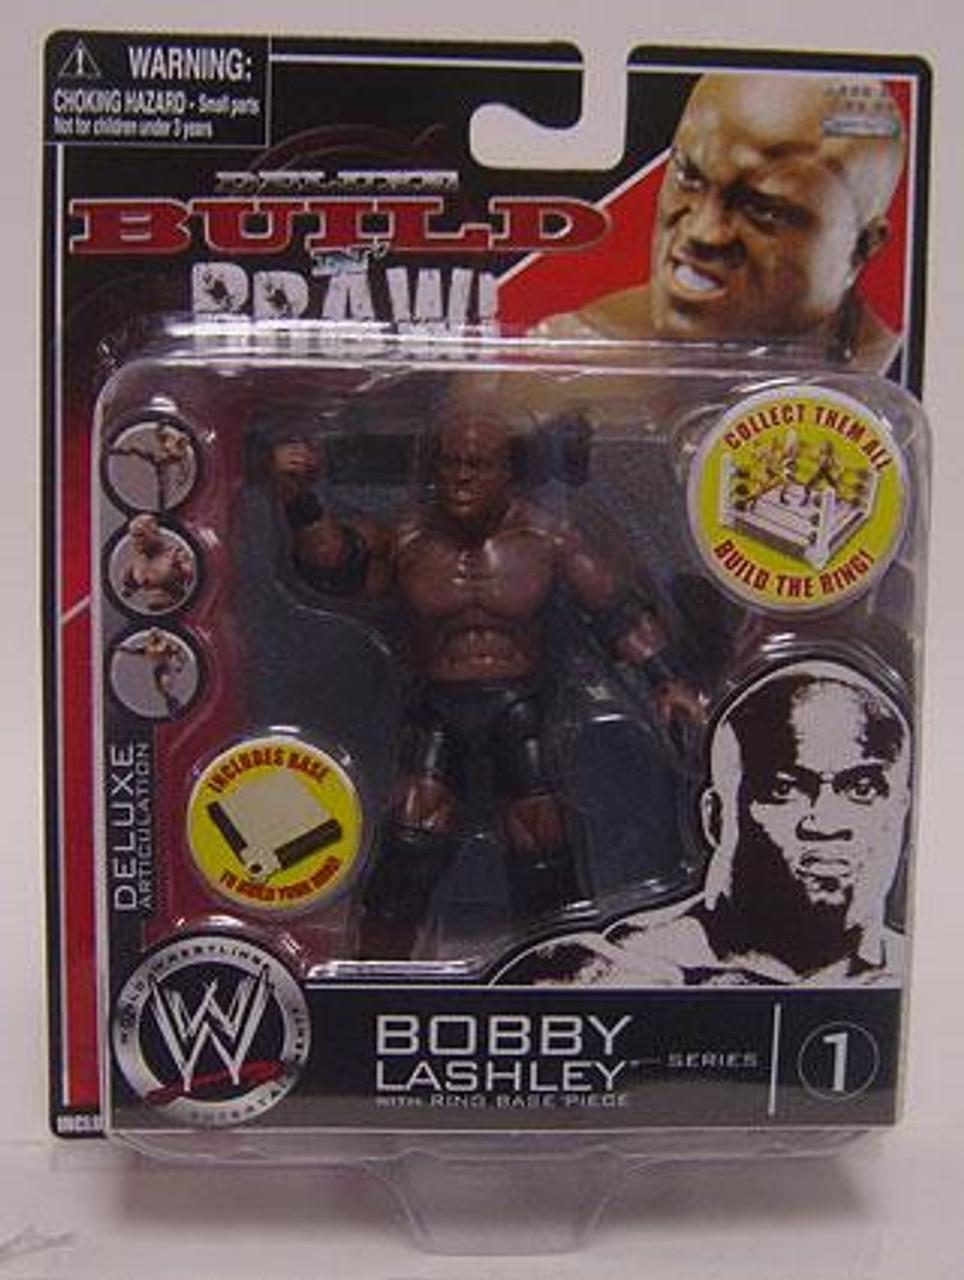 WWE Wrestling Build N' Brawl Series 1 Bobby Lashley Action Figure